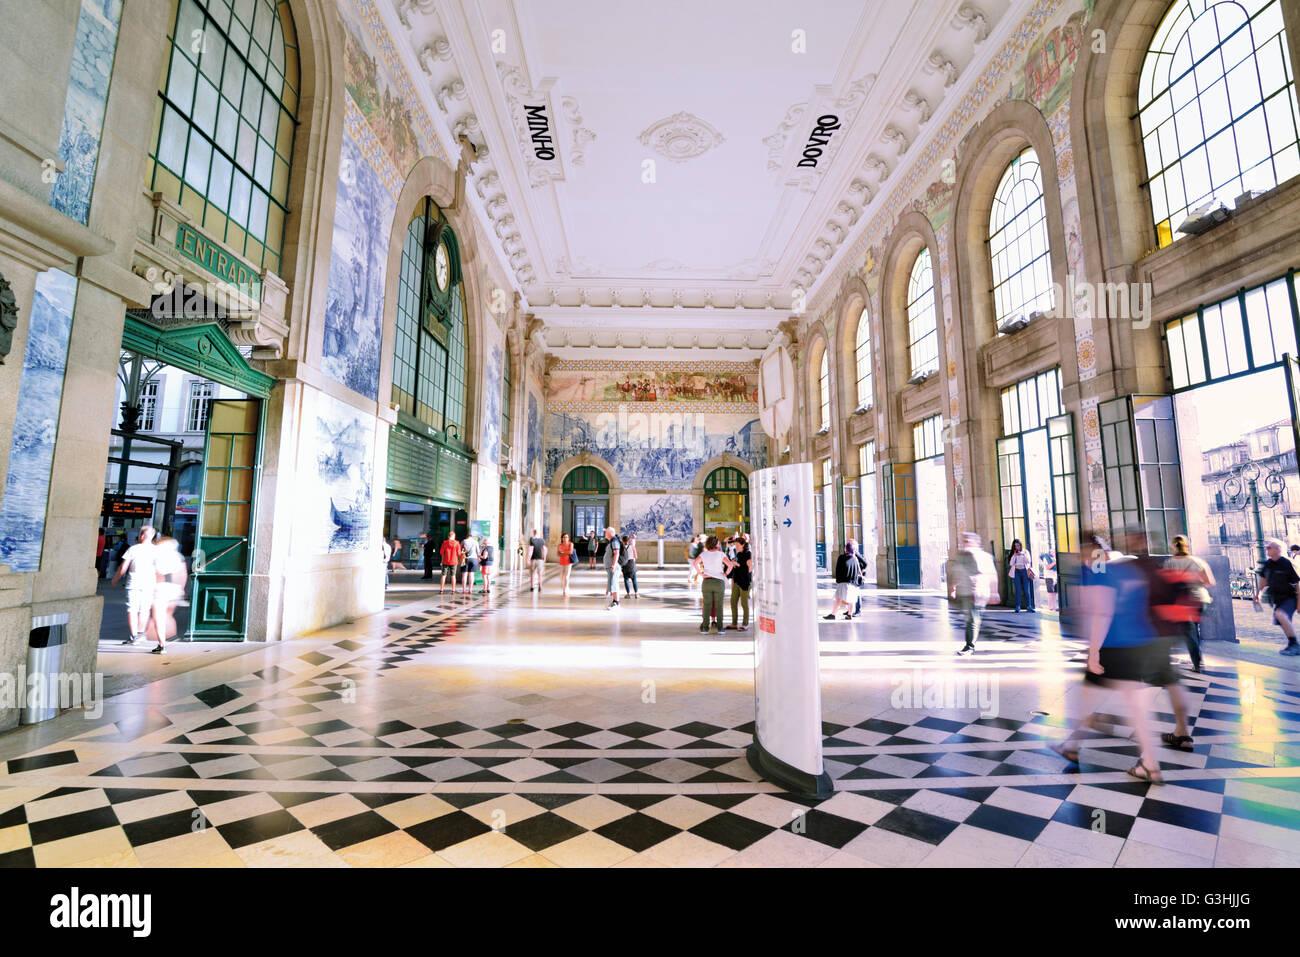 Portugal, Oporto: Tile decorated hall of the  historic train station Sao Bento - Stock Image